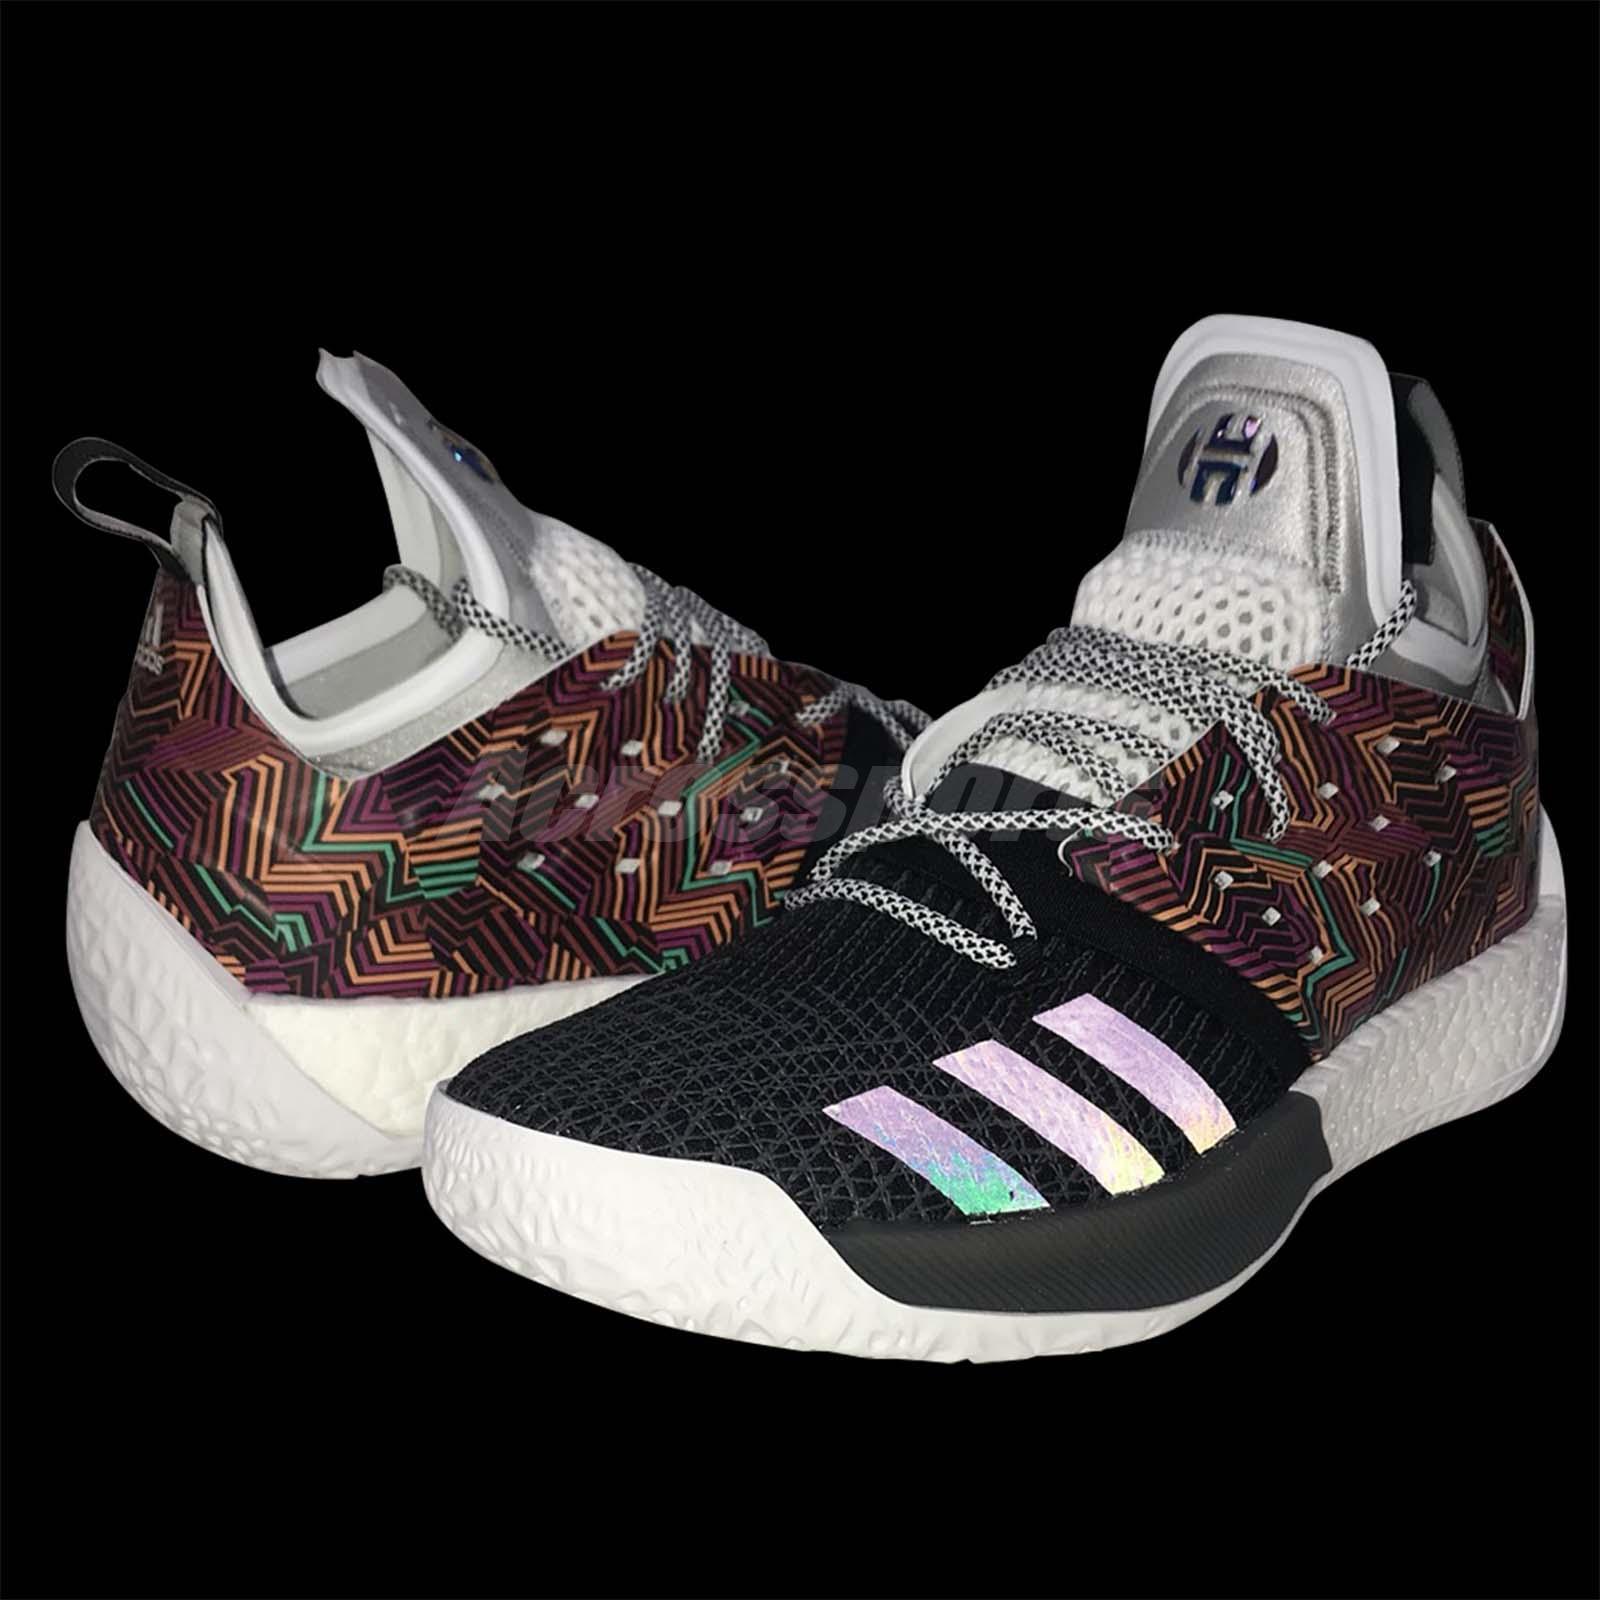 James Harden Shoes Vol 2: Adidas Harden Vol. 2 II James Summer Pack Boost Multi